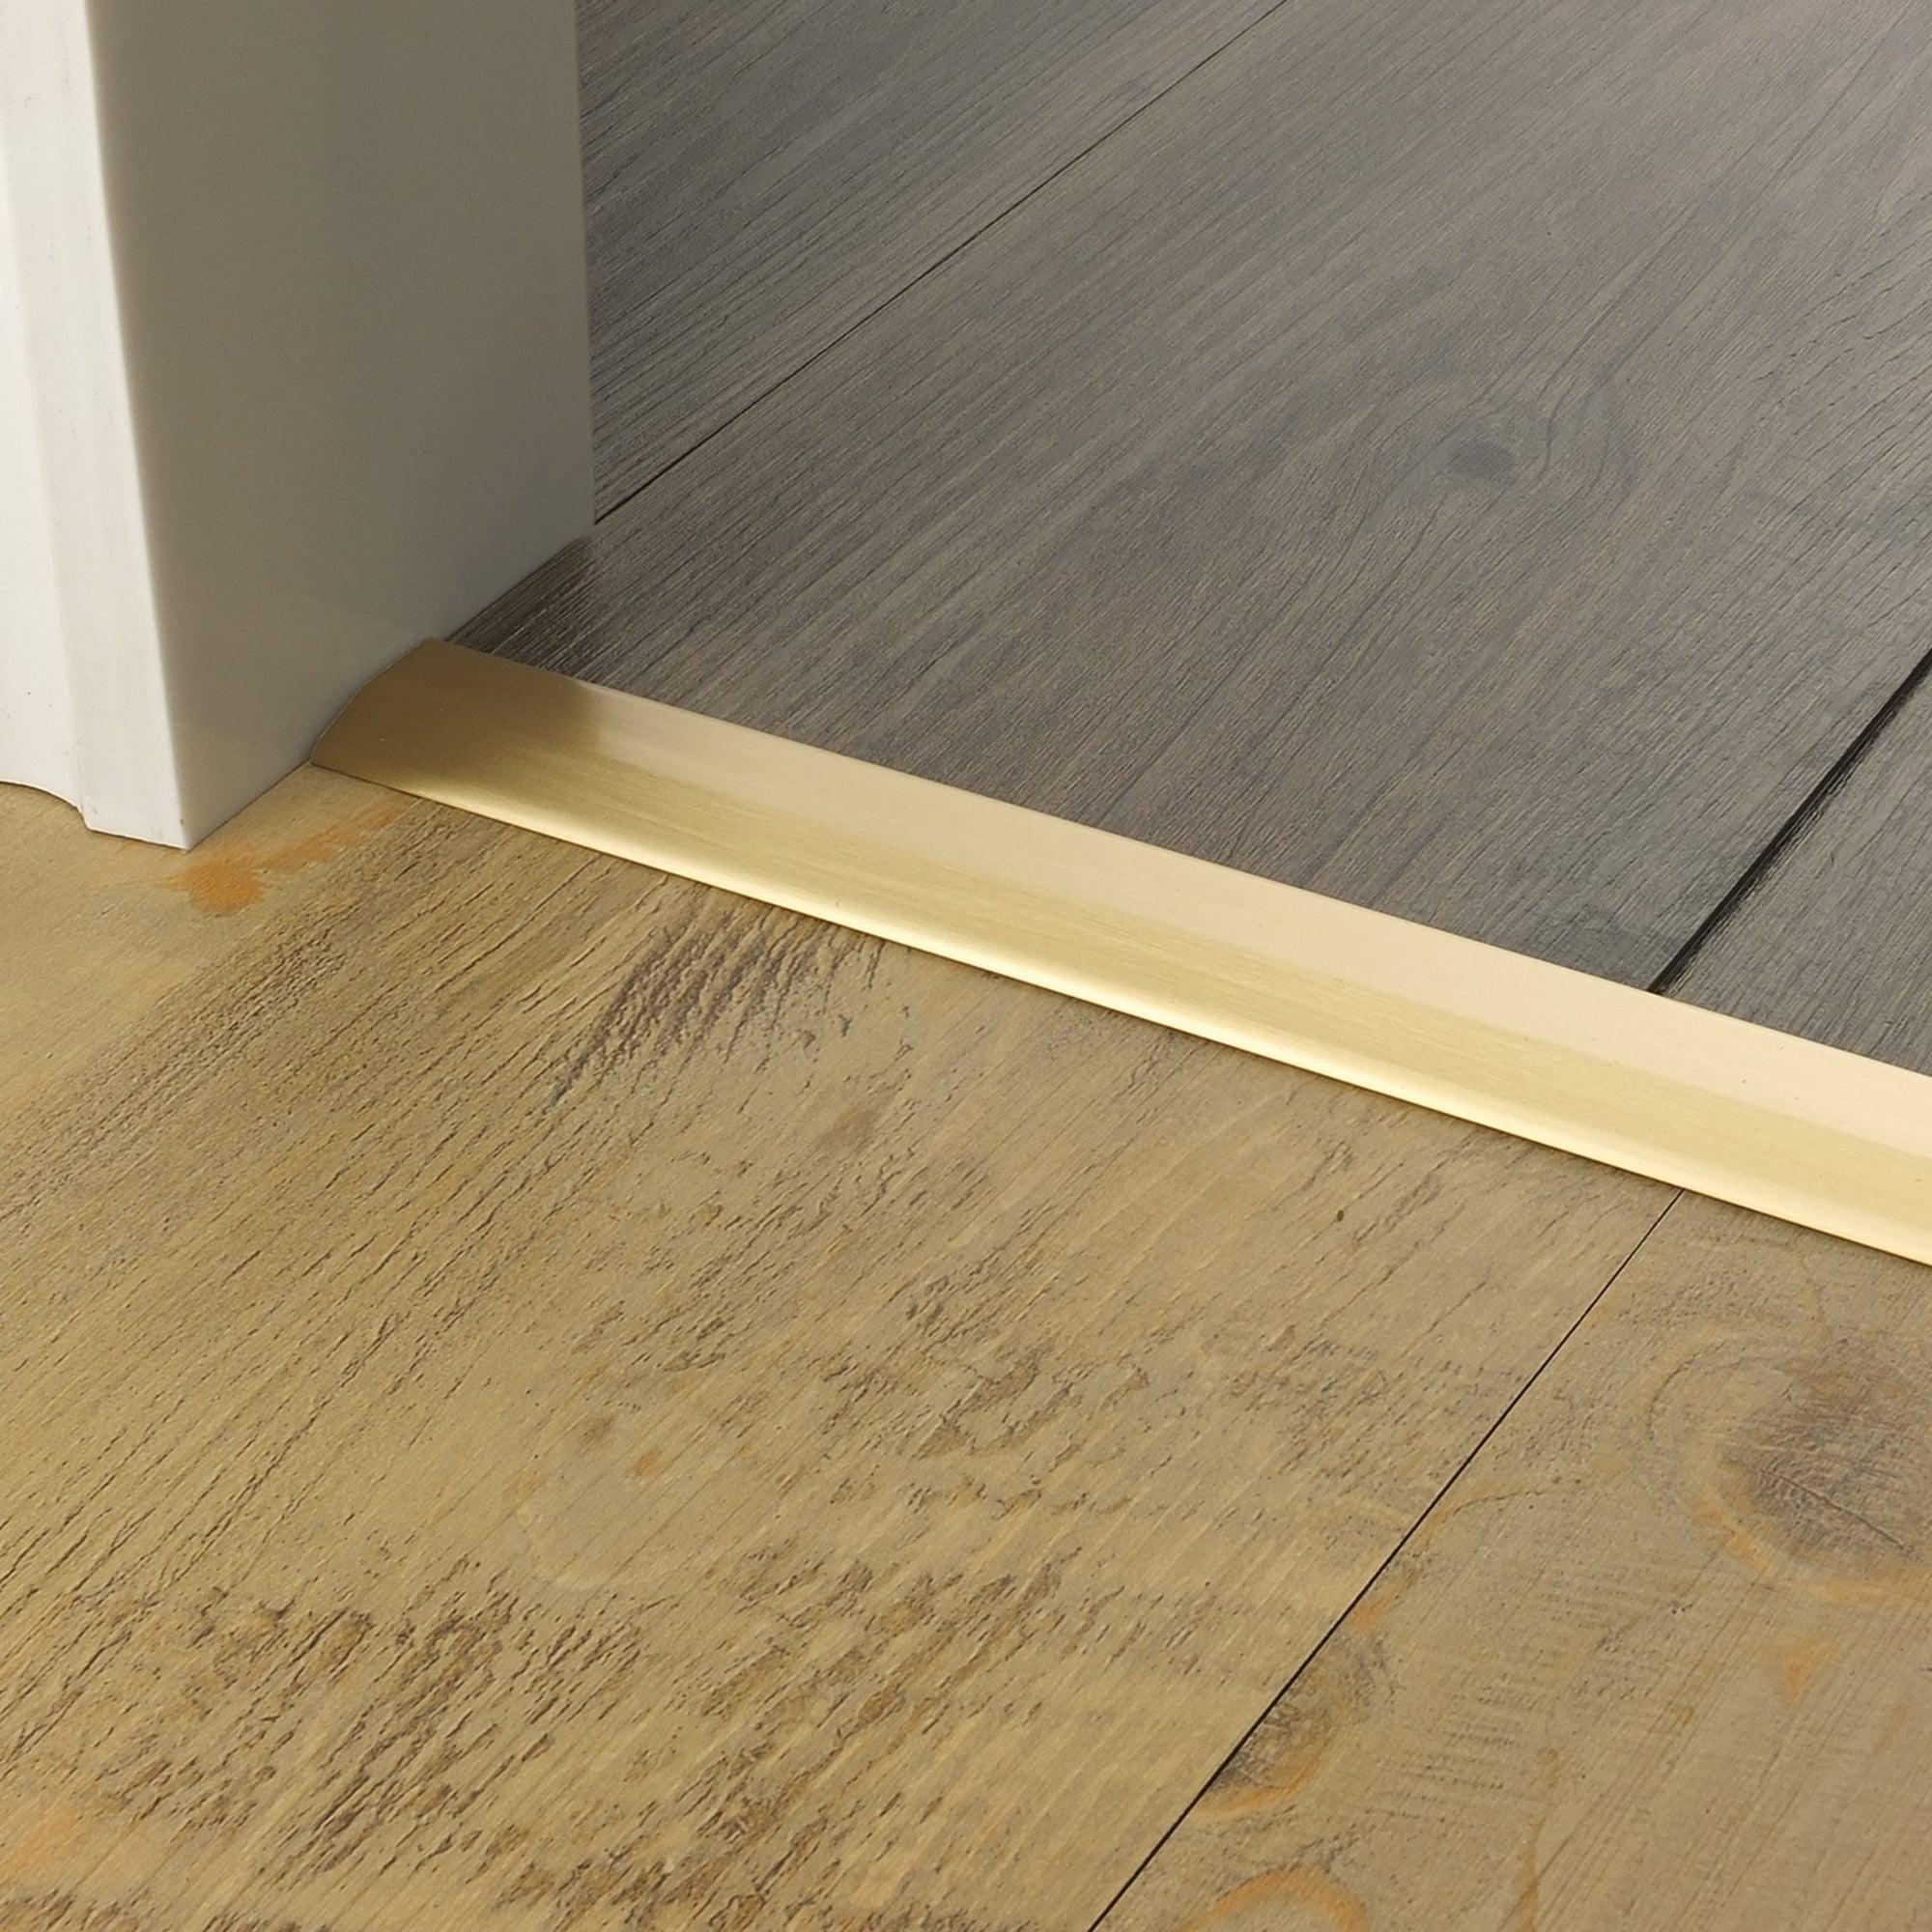 buildings carpet classy wooden floor page estate reducer and strong tile trim oak hardwood on information portal trims